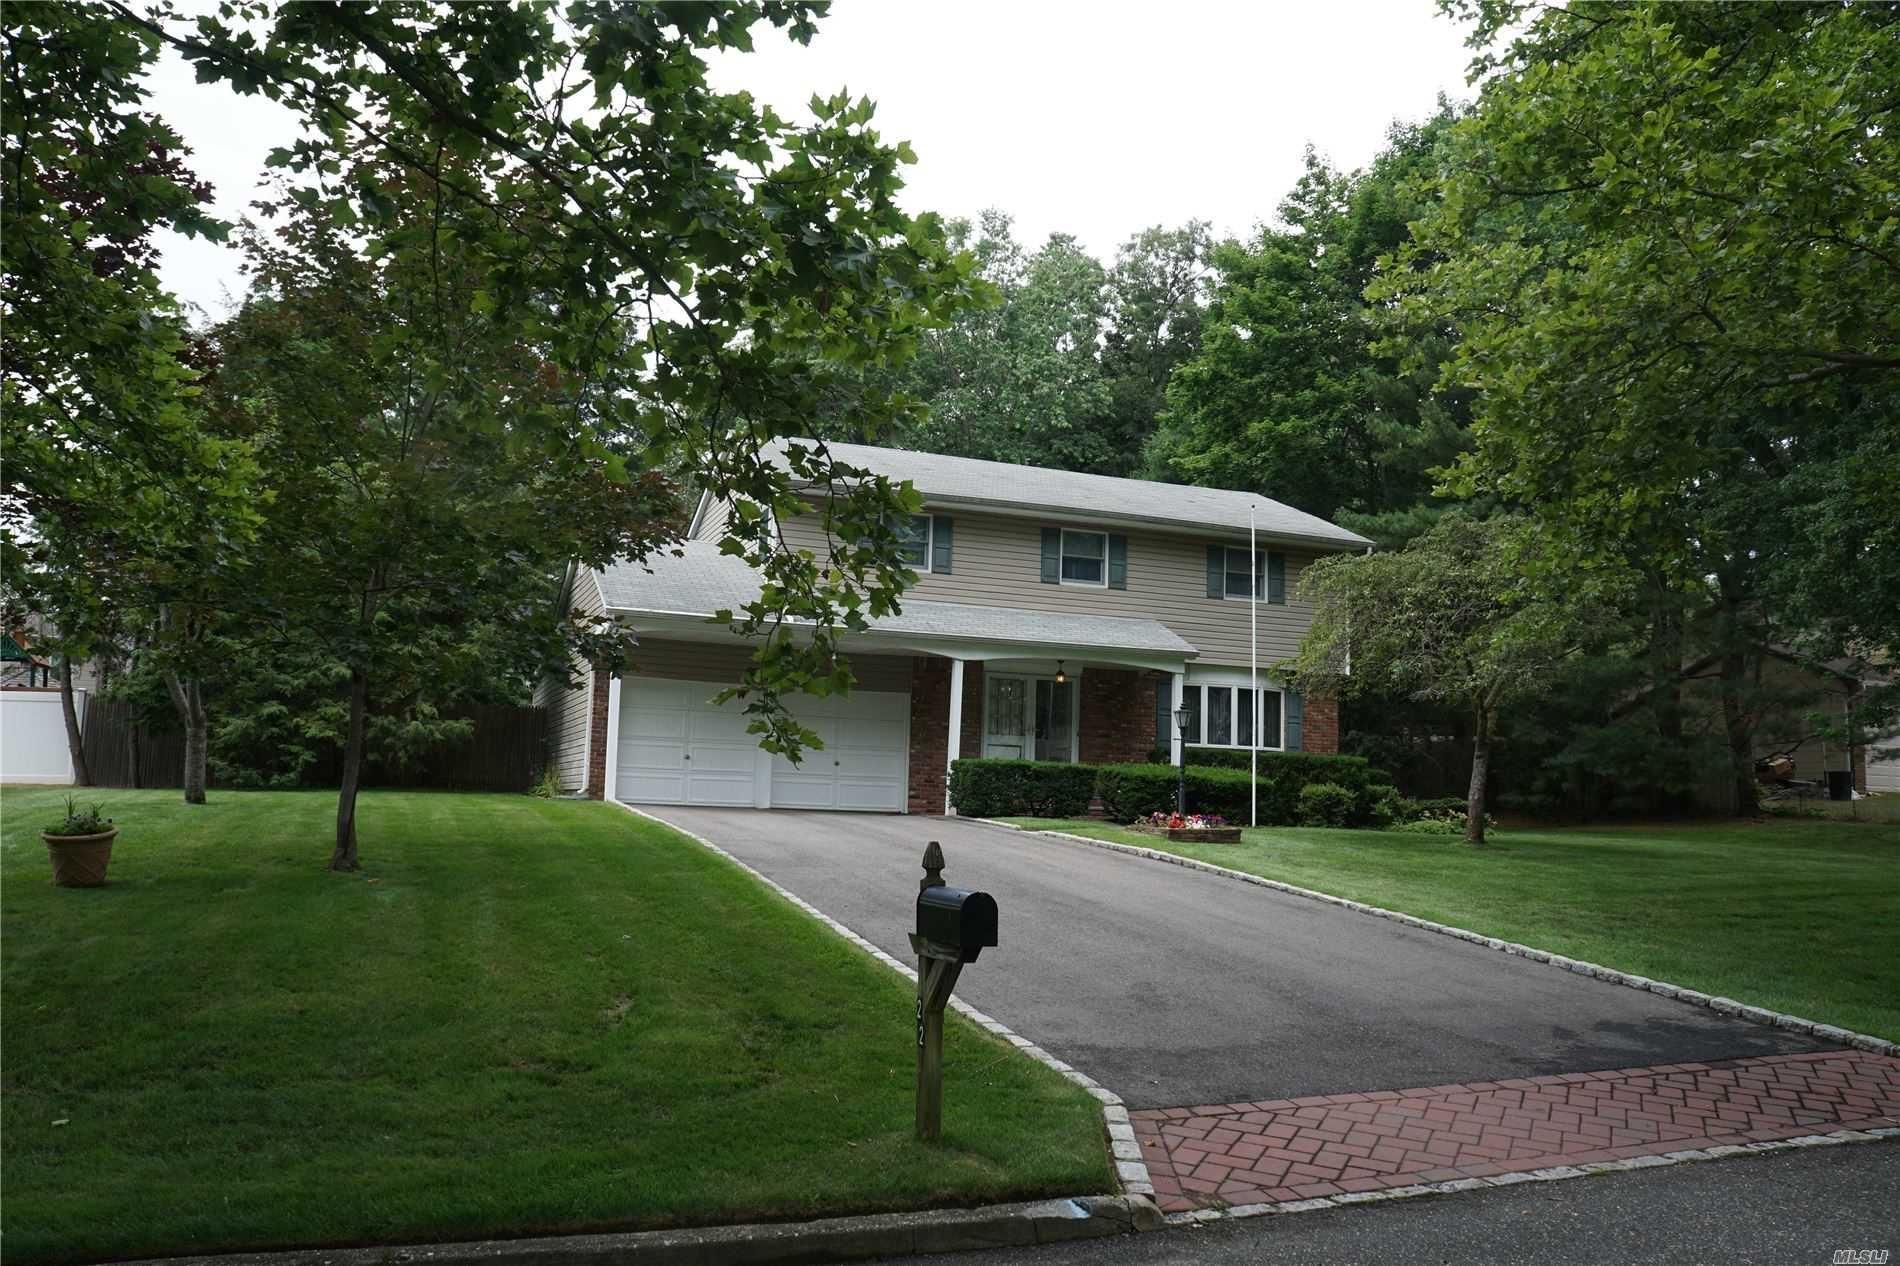 22 Bruce Lane, East Northport, NY 11731 - MLS#: 3228460